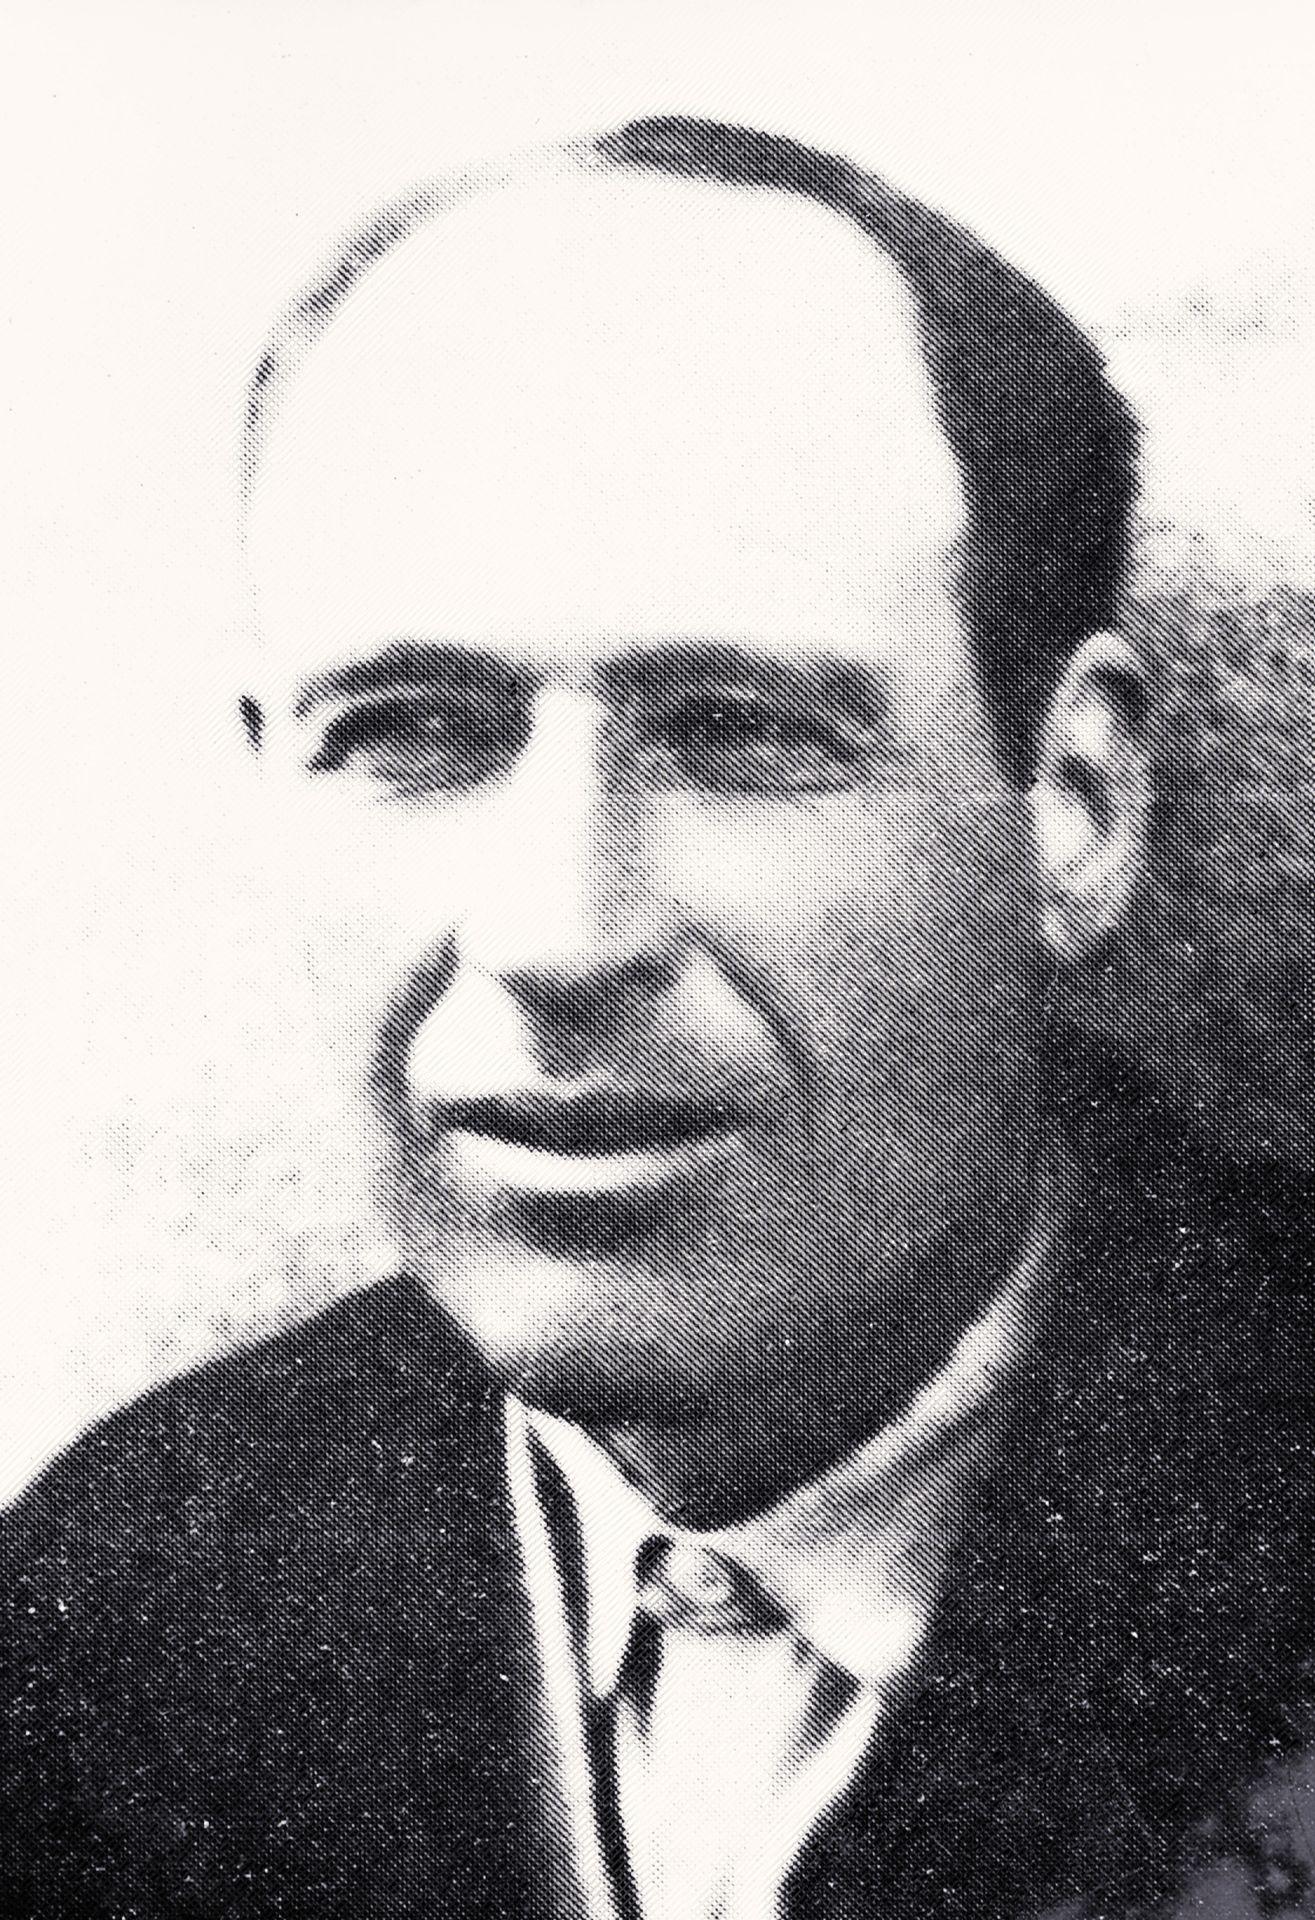 José dos Santos (s/a, CMMN, s/d)